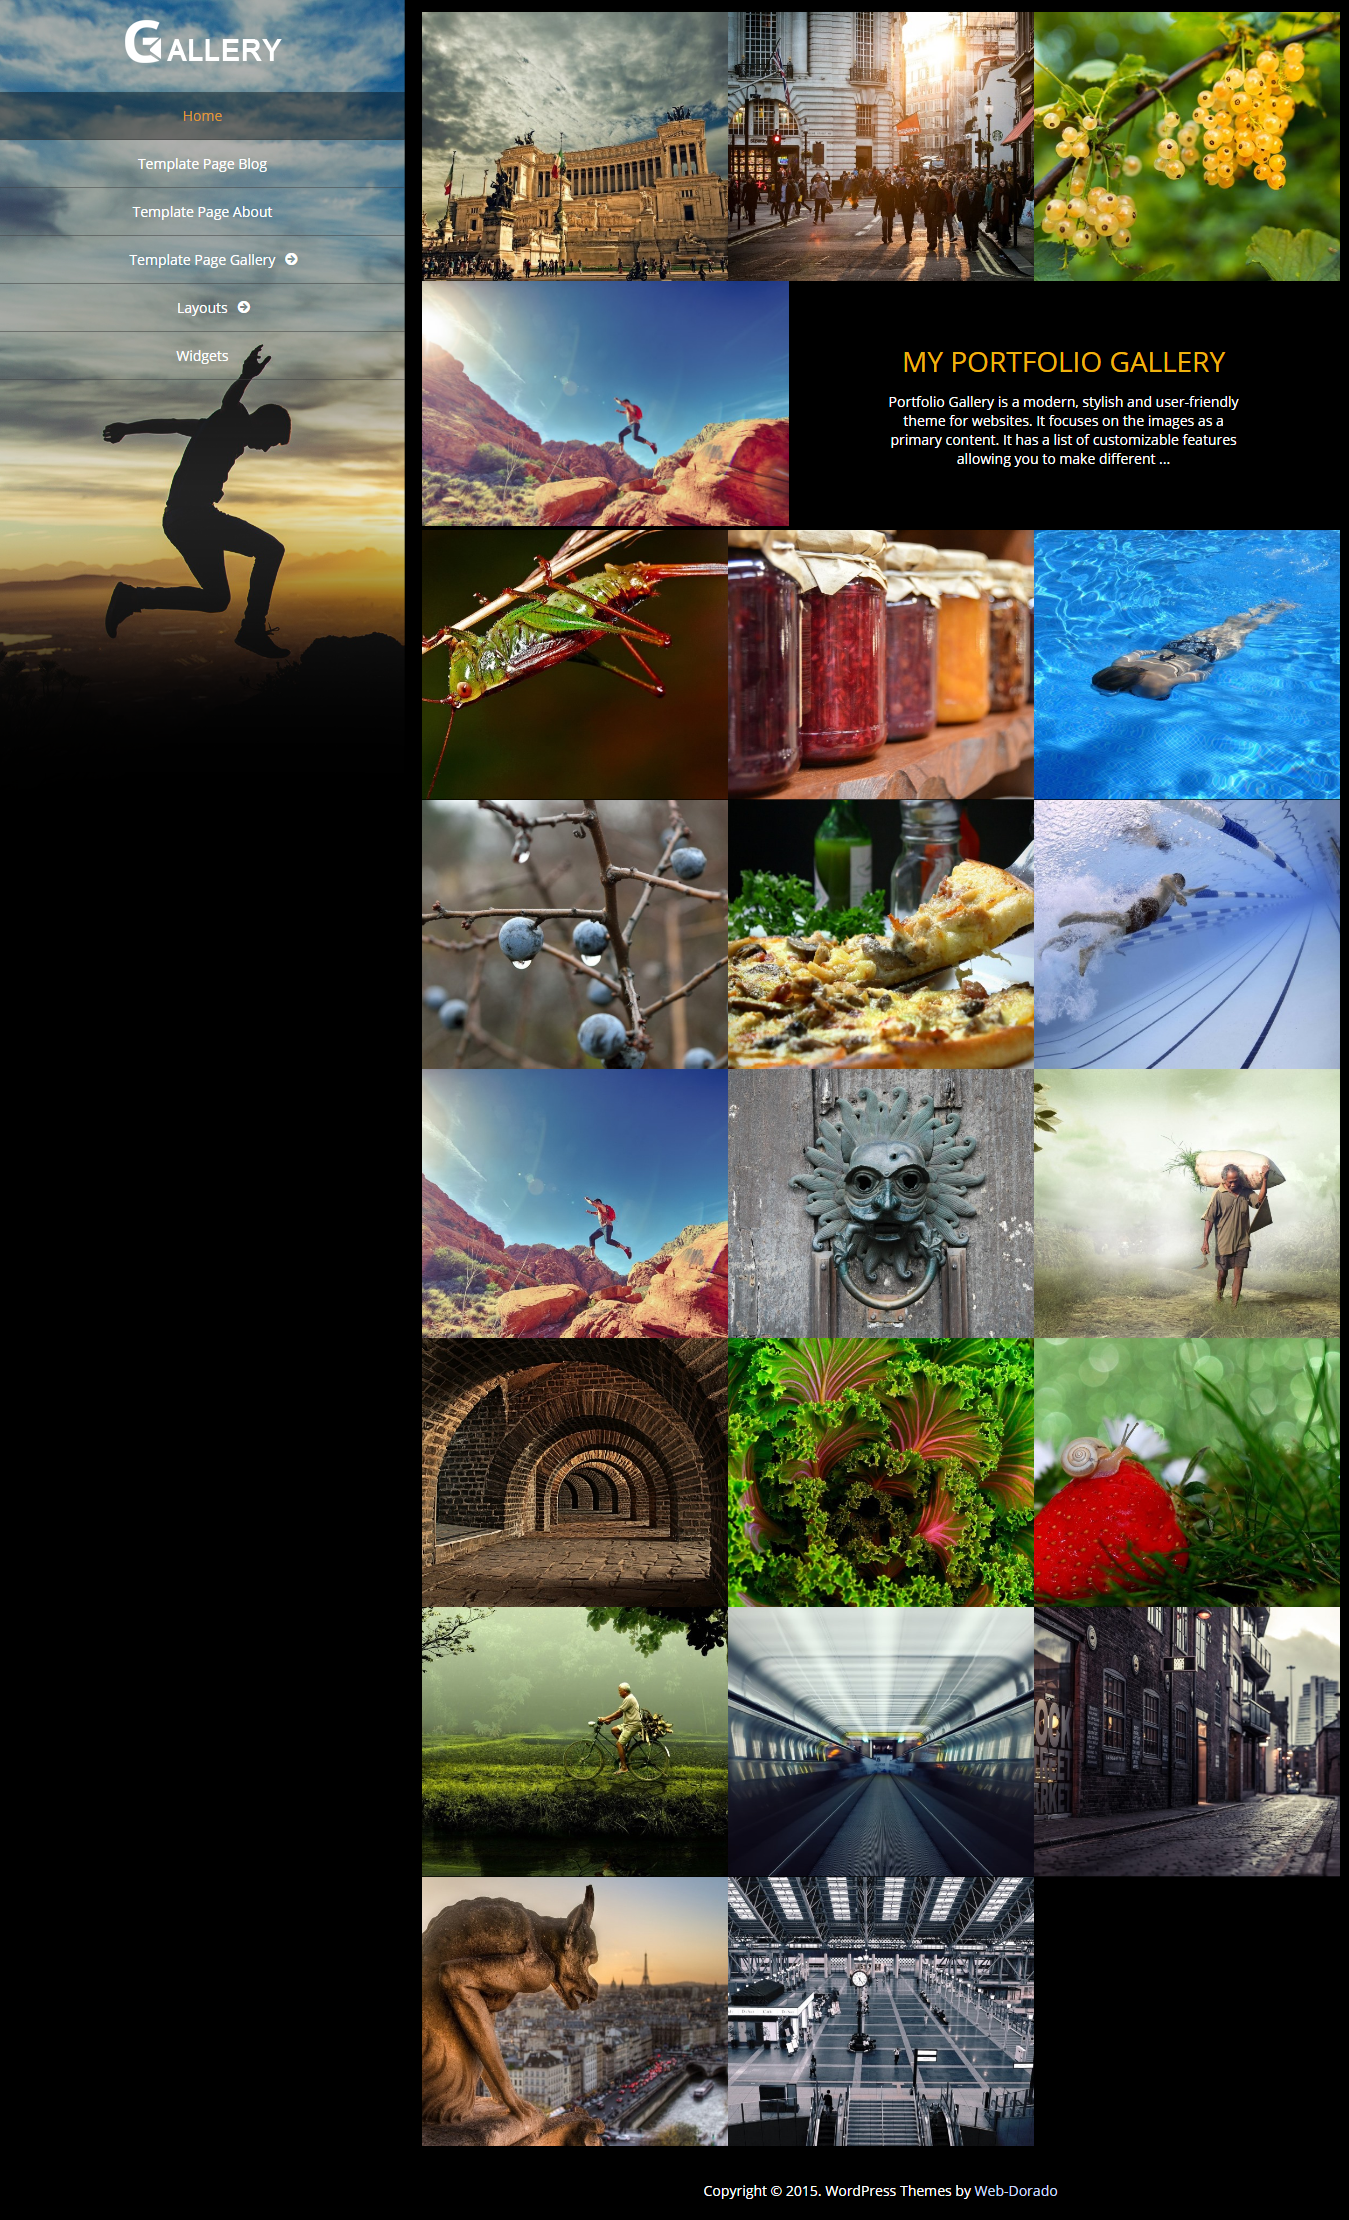 Portfolio Gallery - Best Free Gallery WordPress Theme